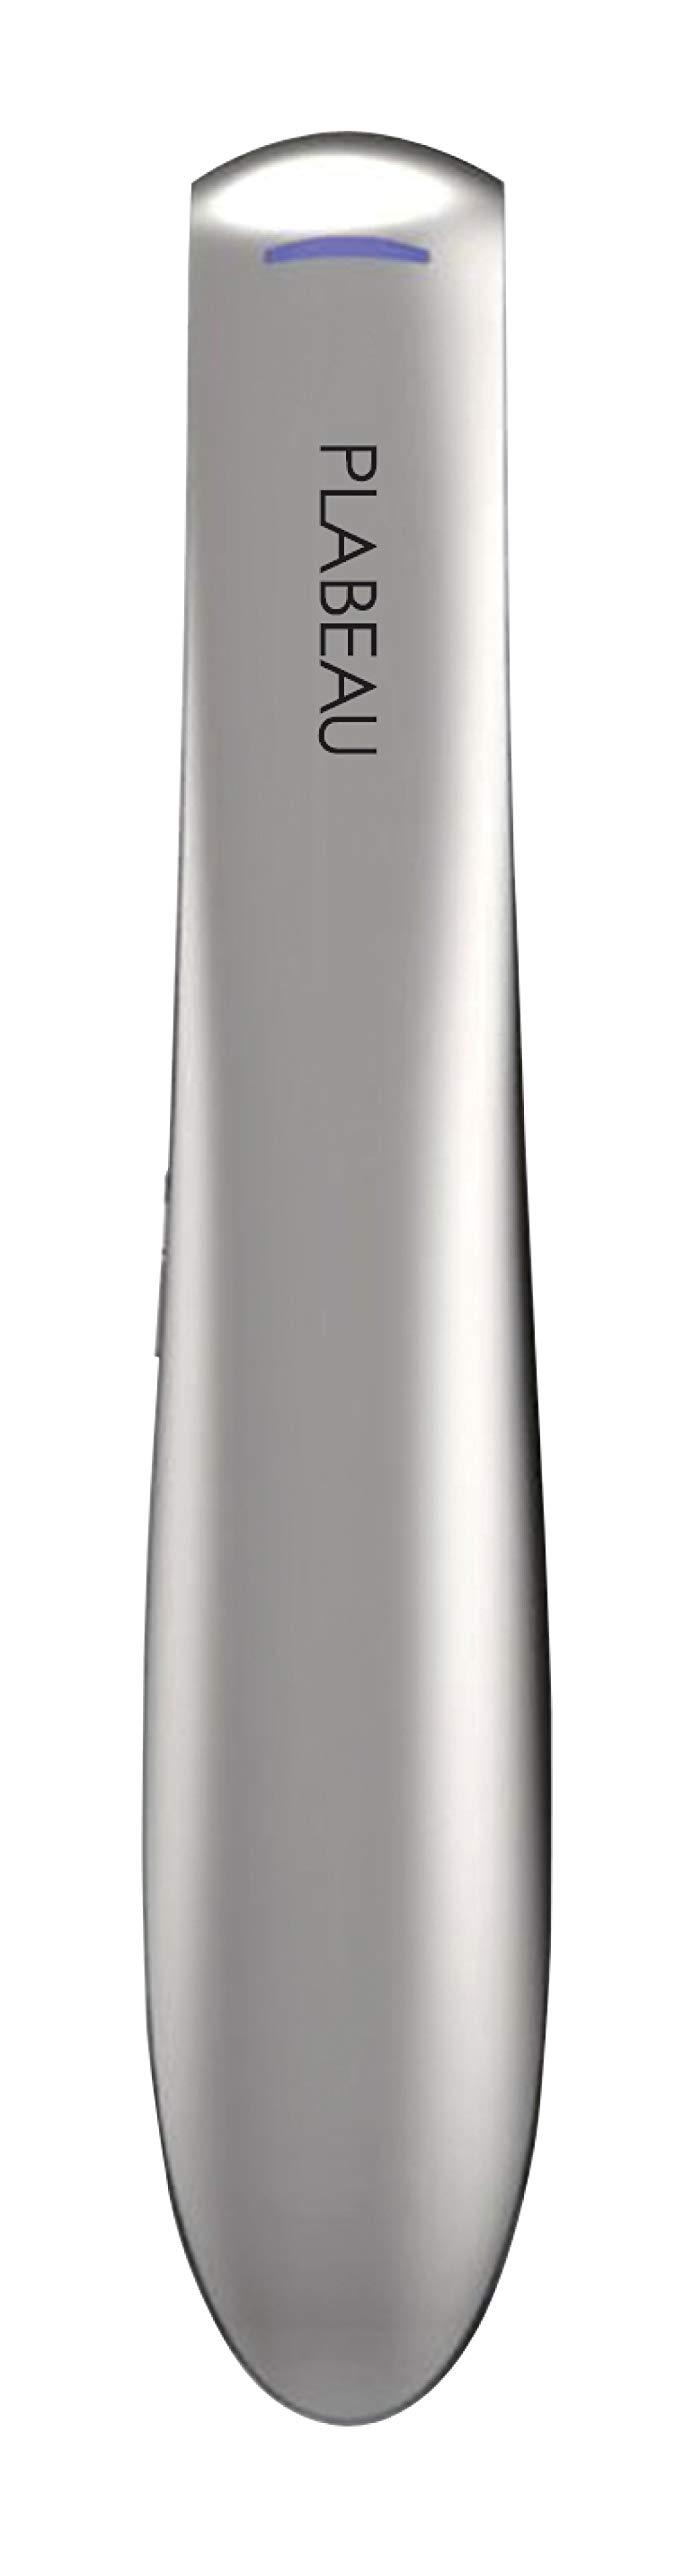 CDM product Daonix PlaBeau Advanced Plasma Technology Portable Skin Care Device (Silver) big image